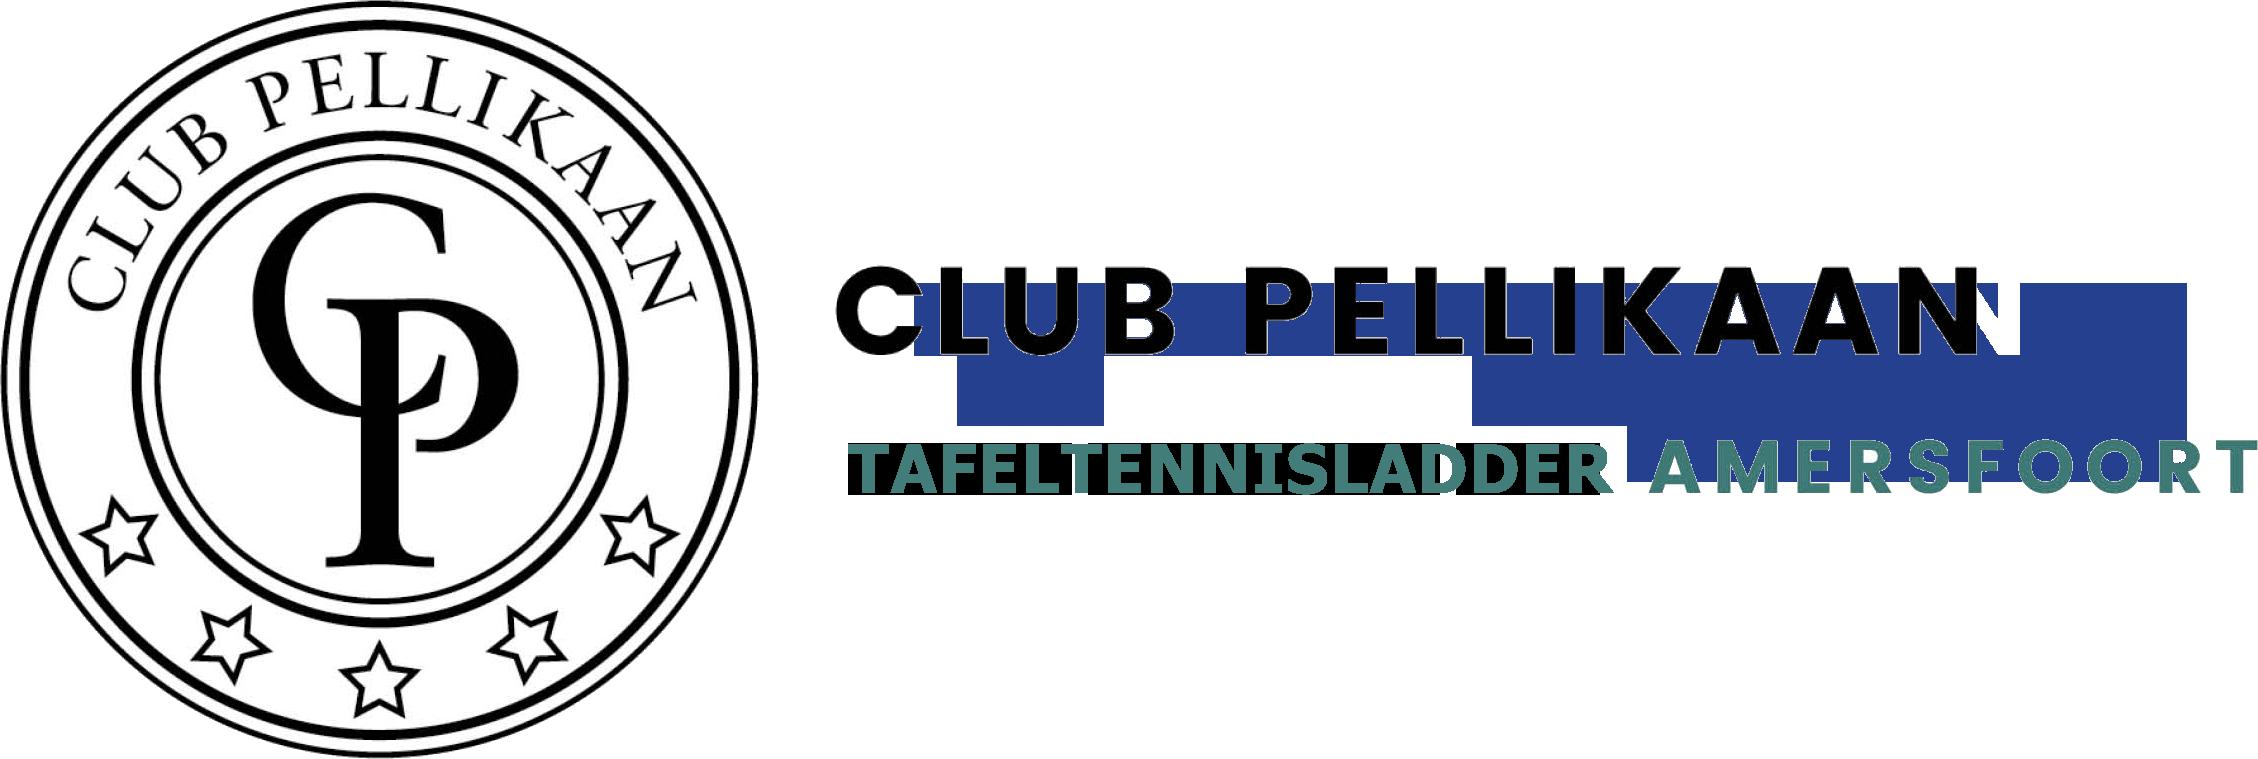 Club Pellikaan Amersfoort